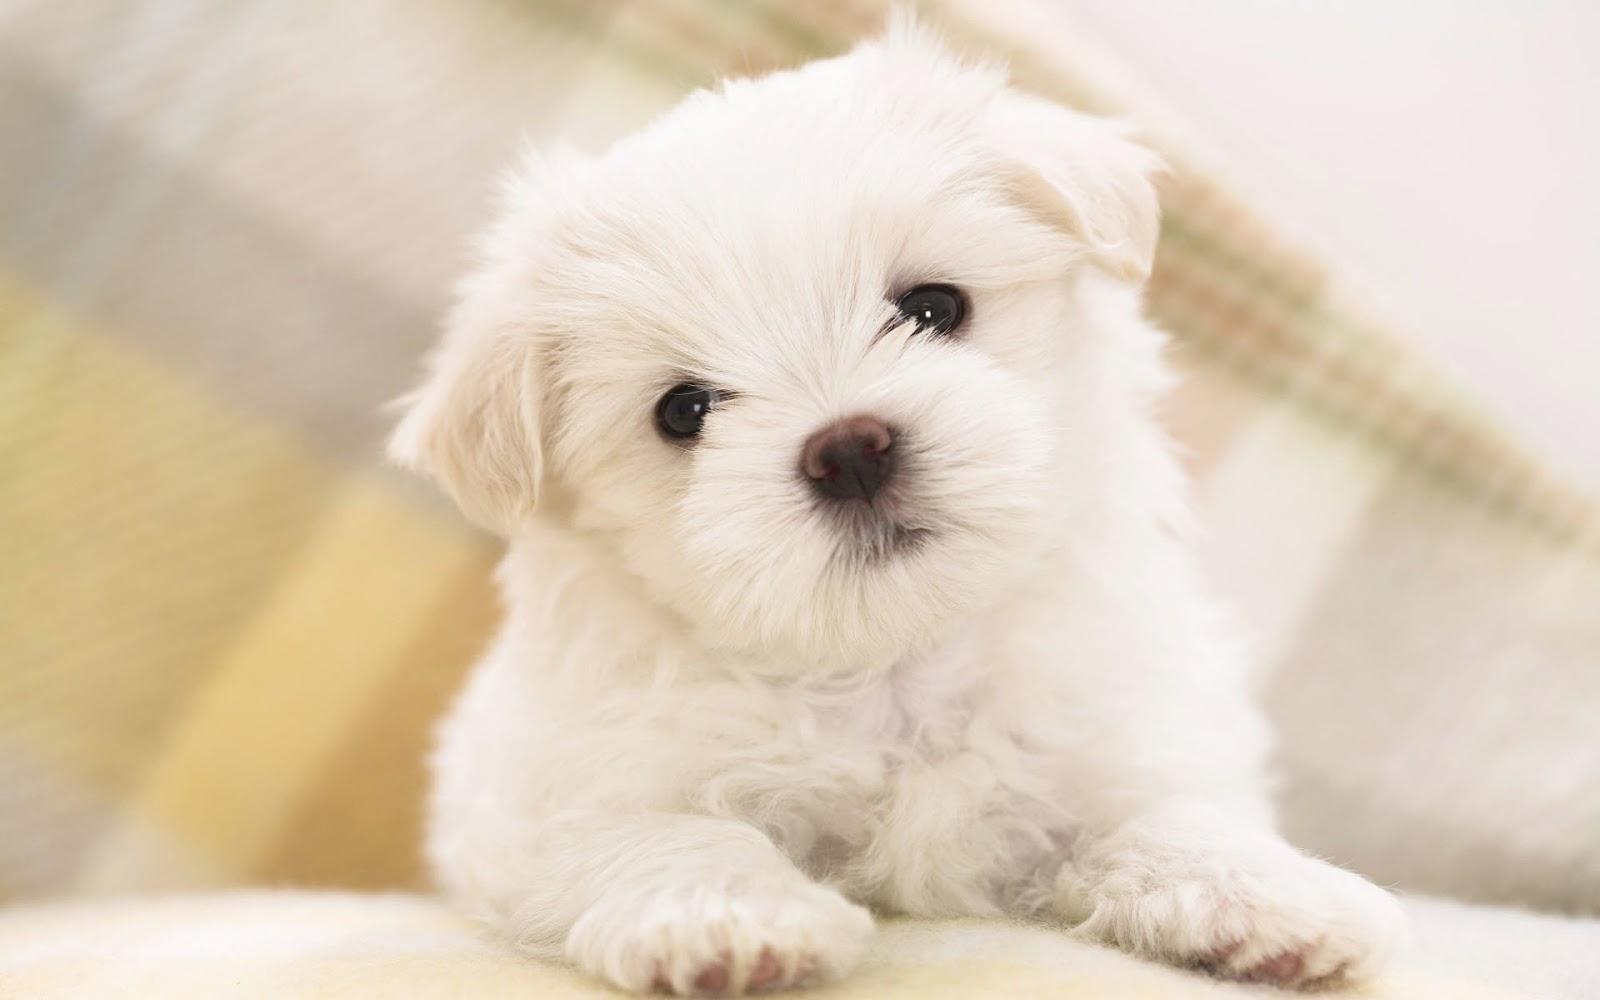 Cute Puppy Dogs: cute maltese puppy